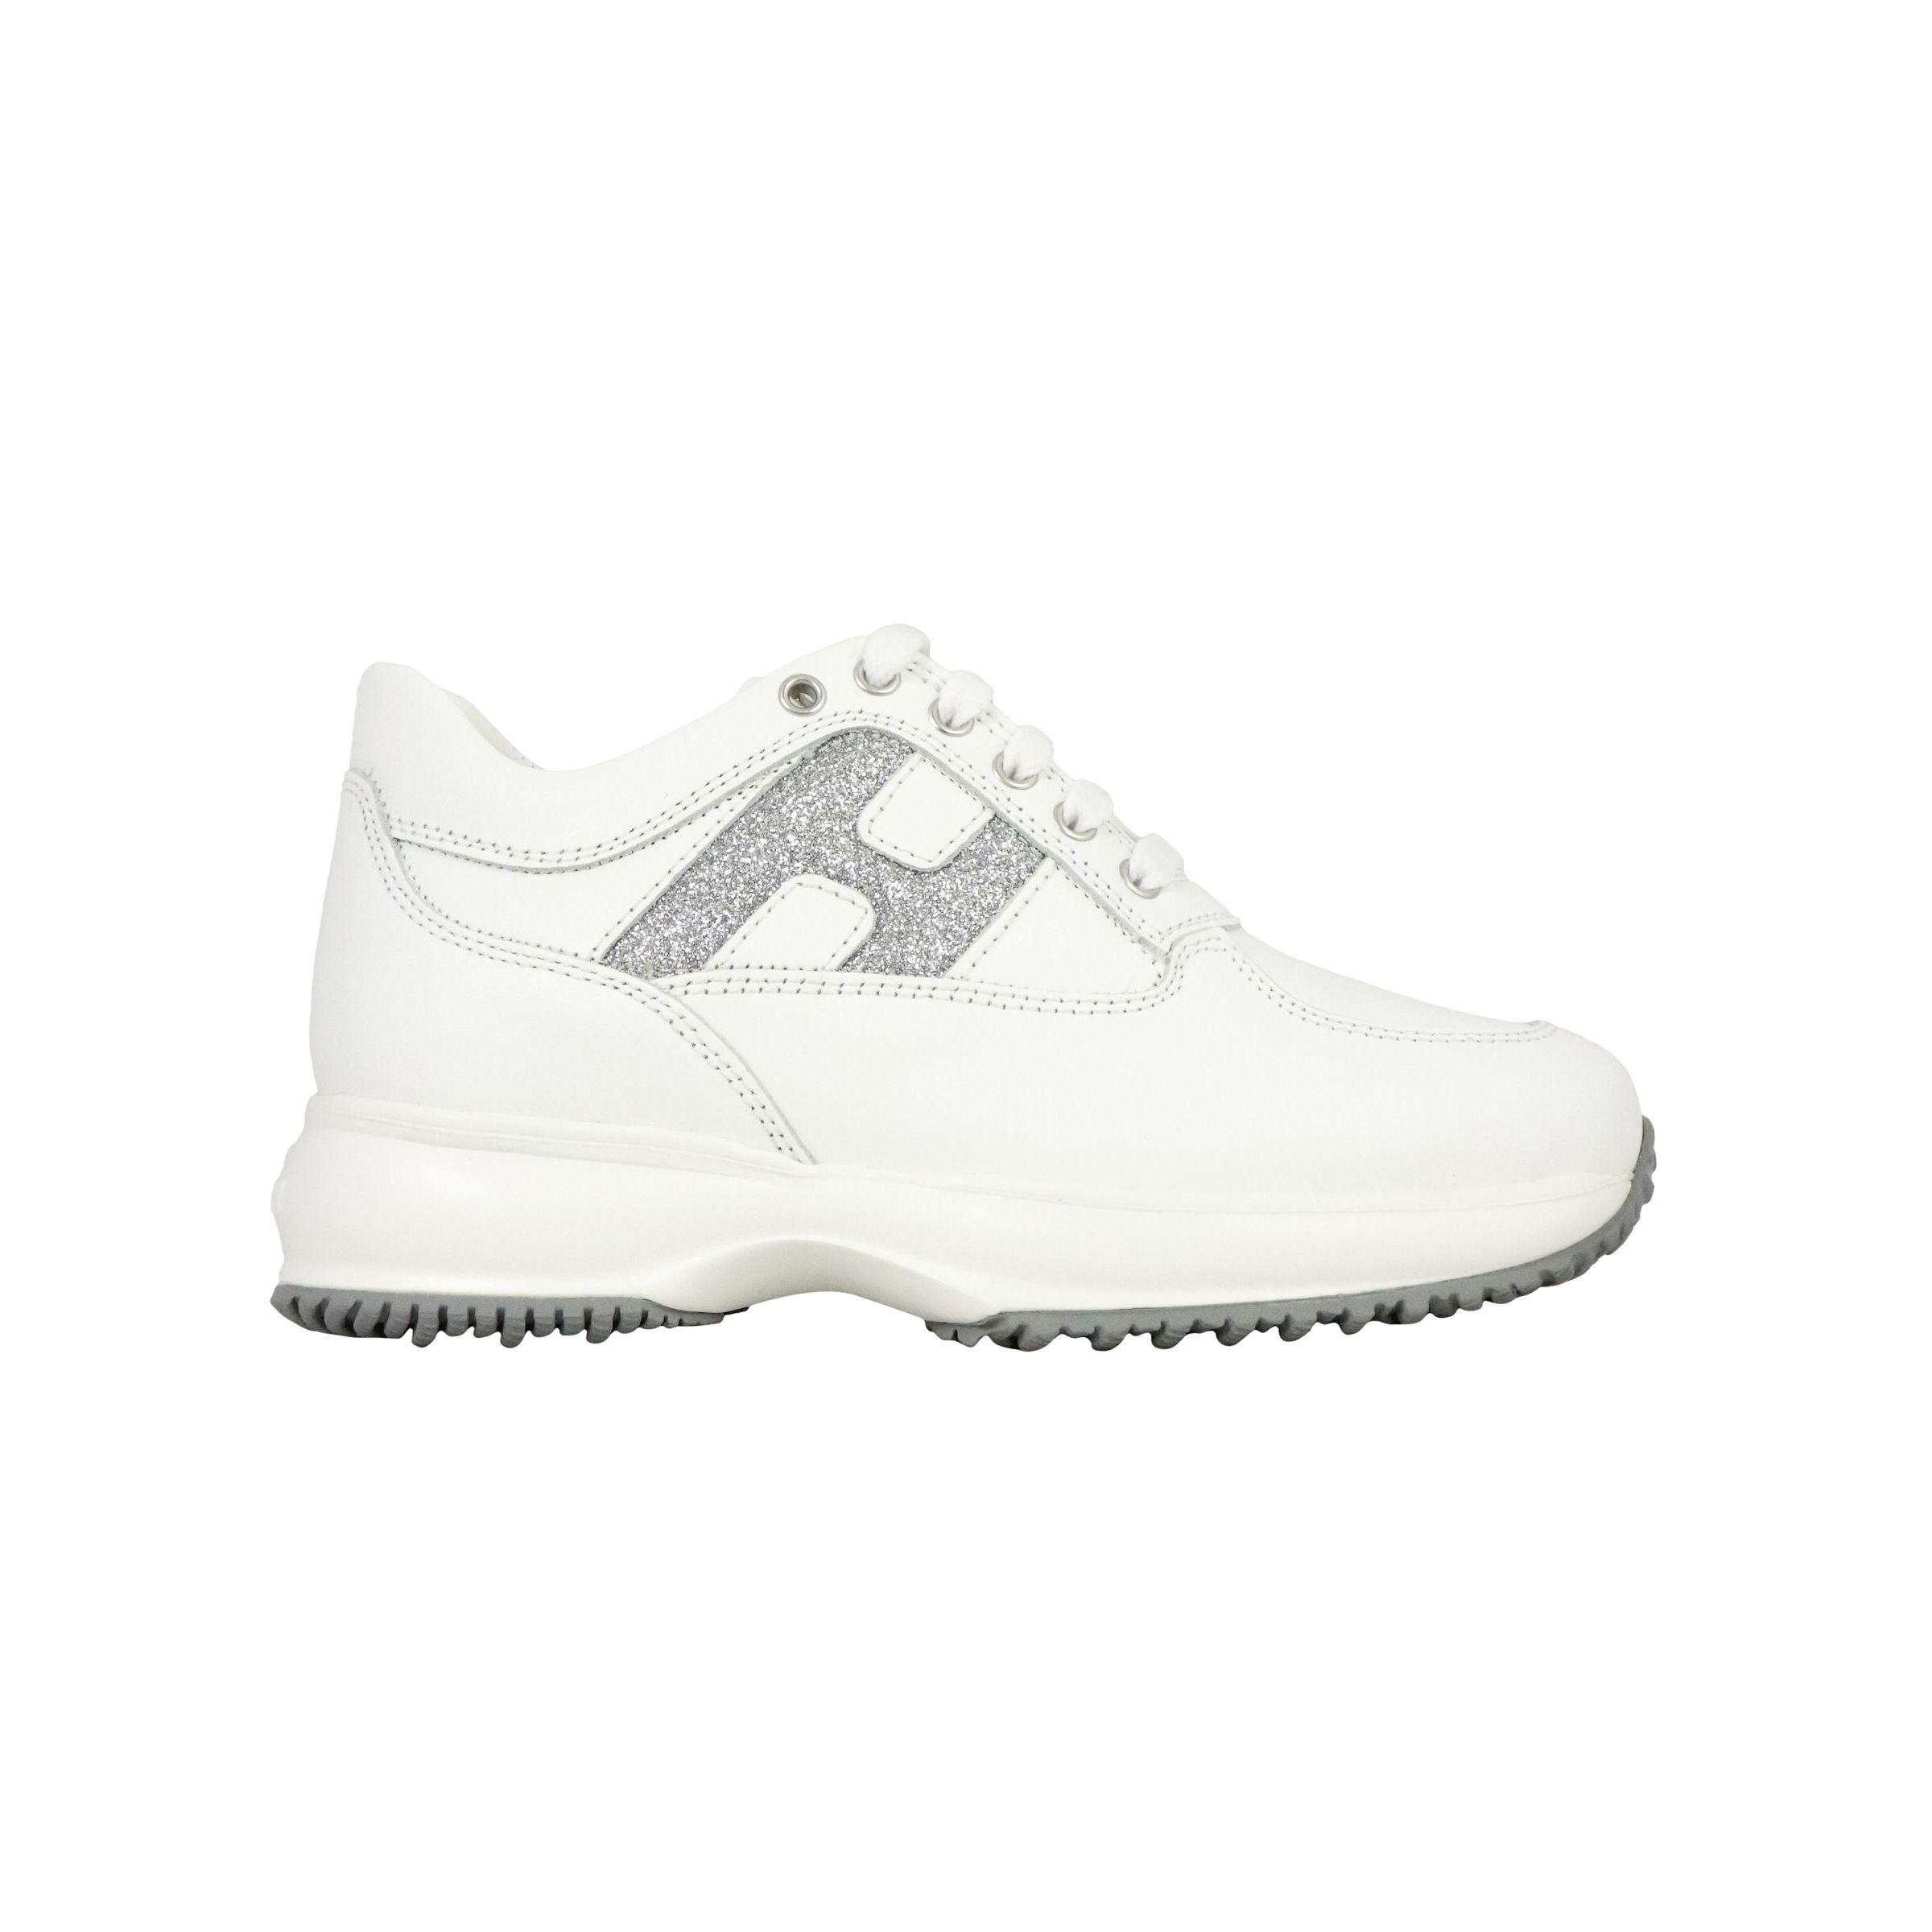 Sneakers Hogan Interactive in pelle con H glitter Bianco/argento ...